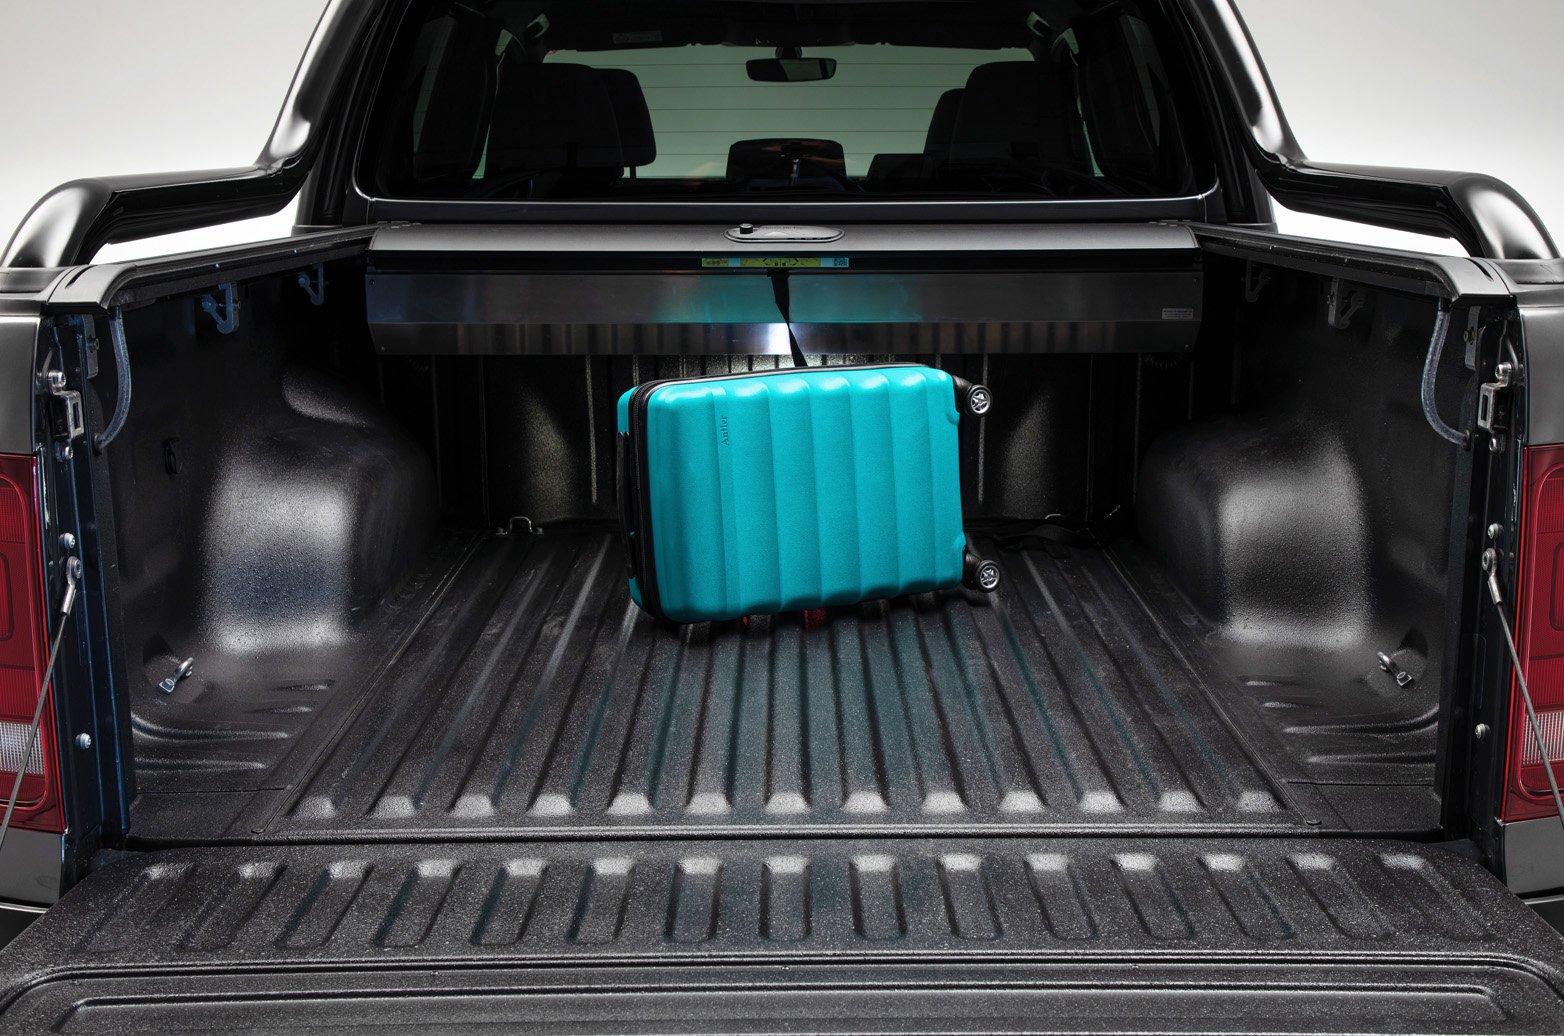 Volkswagen Amarok load bay - 69 plate